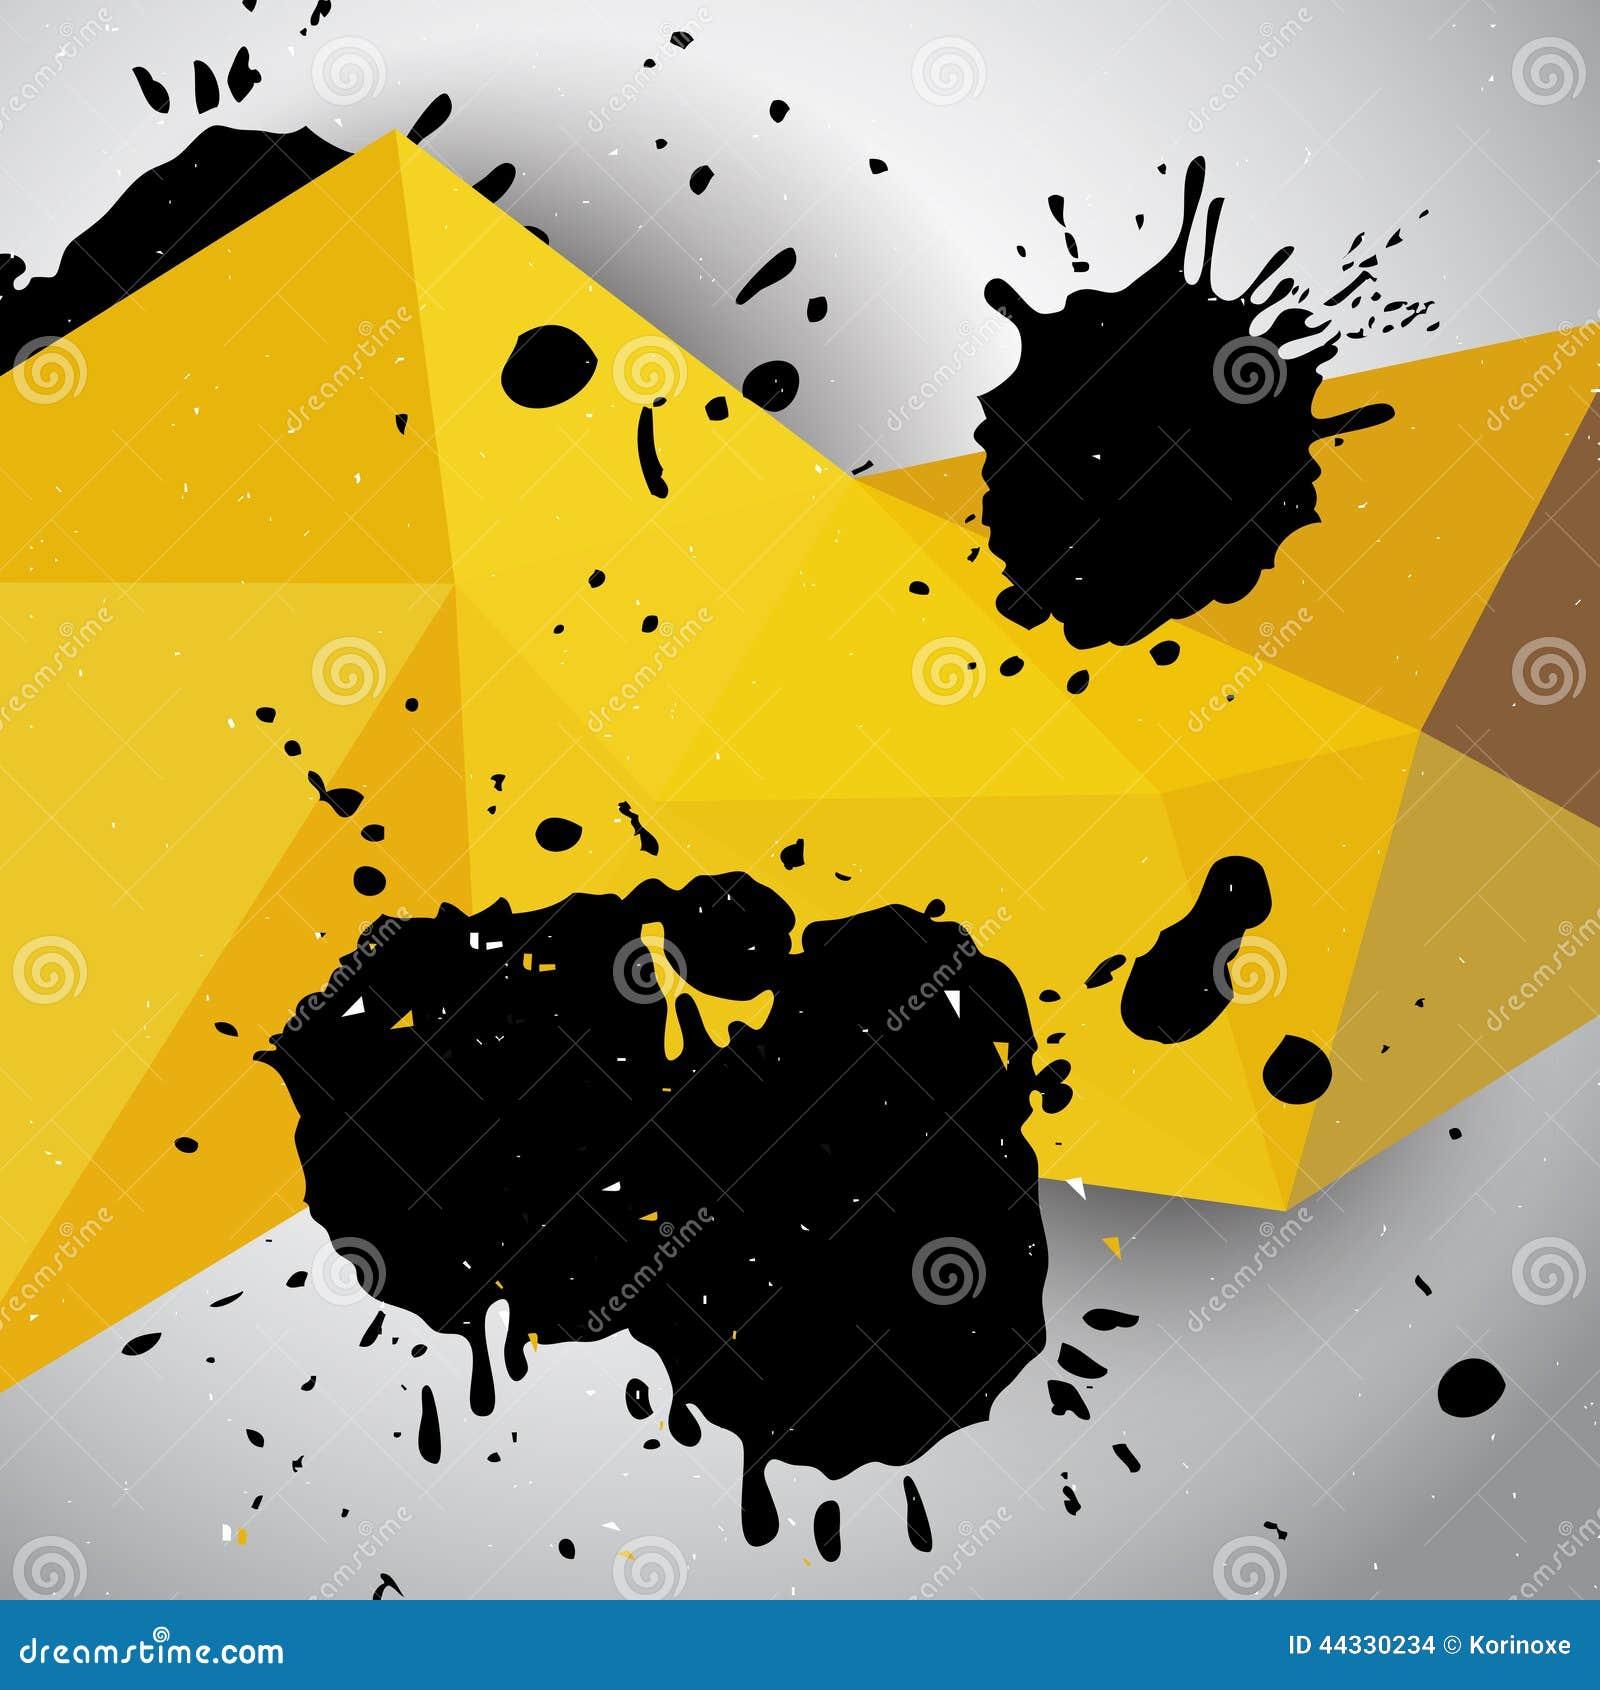 geometric yellow background illustration - photo #36